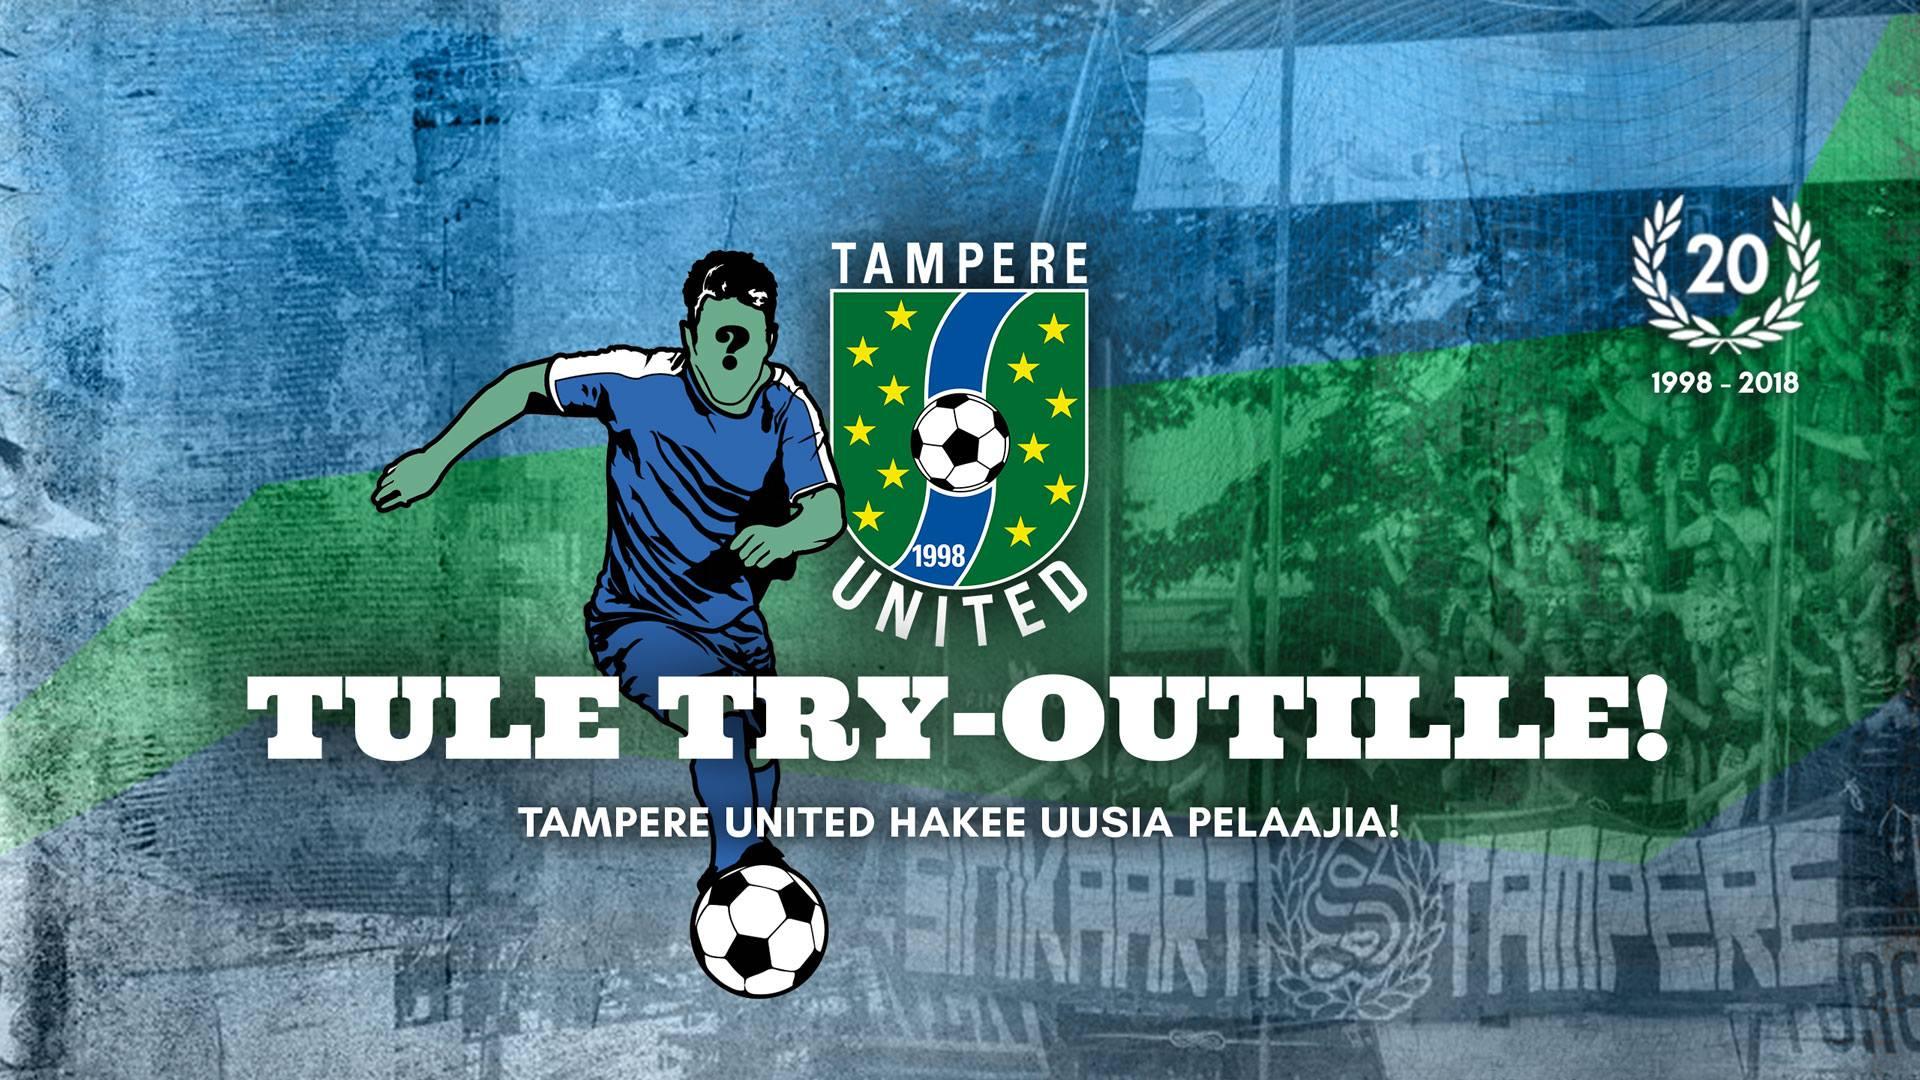 Tule tryoutille Tampere Unitediin -uutiskuva